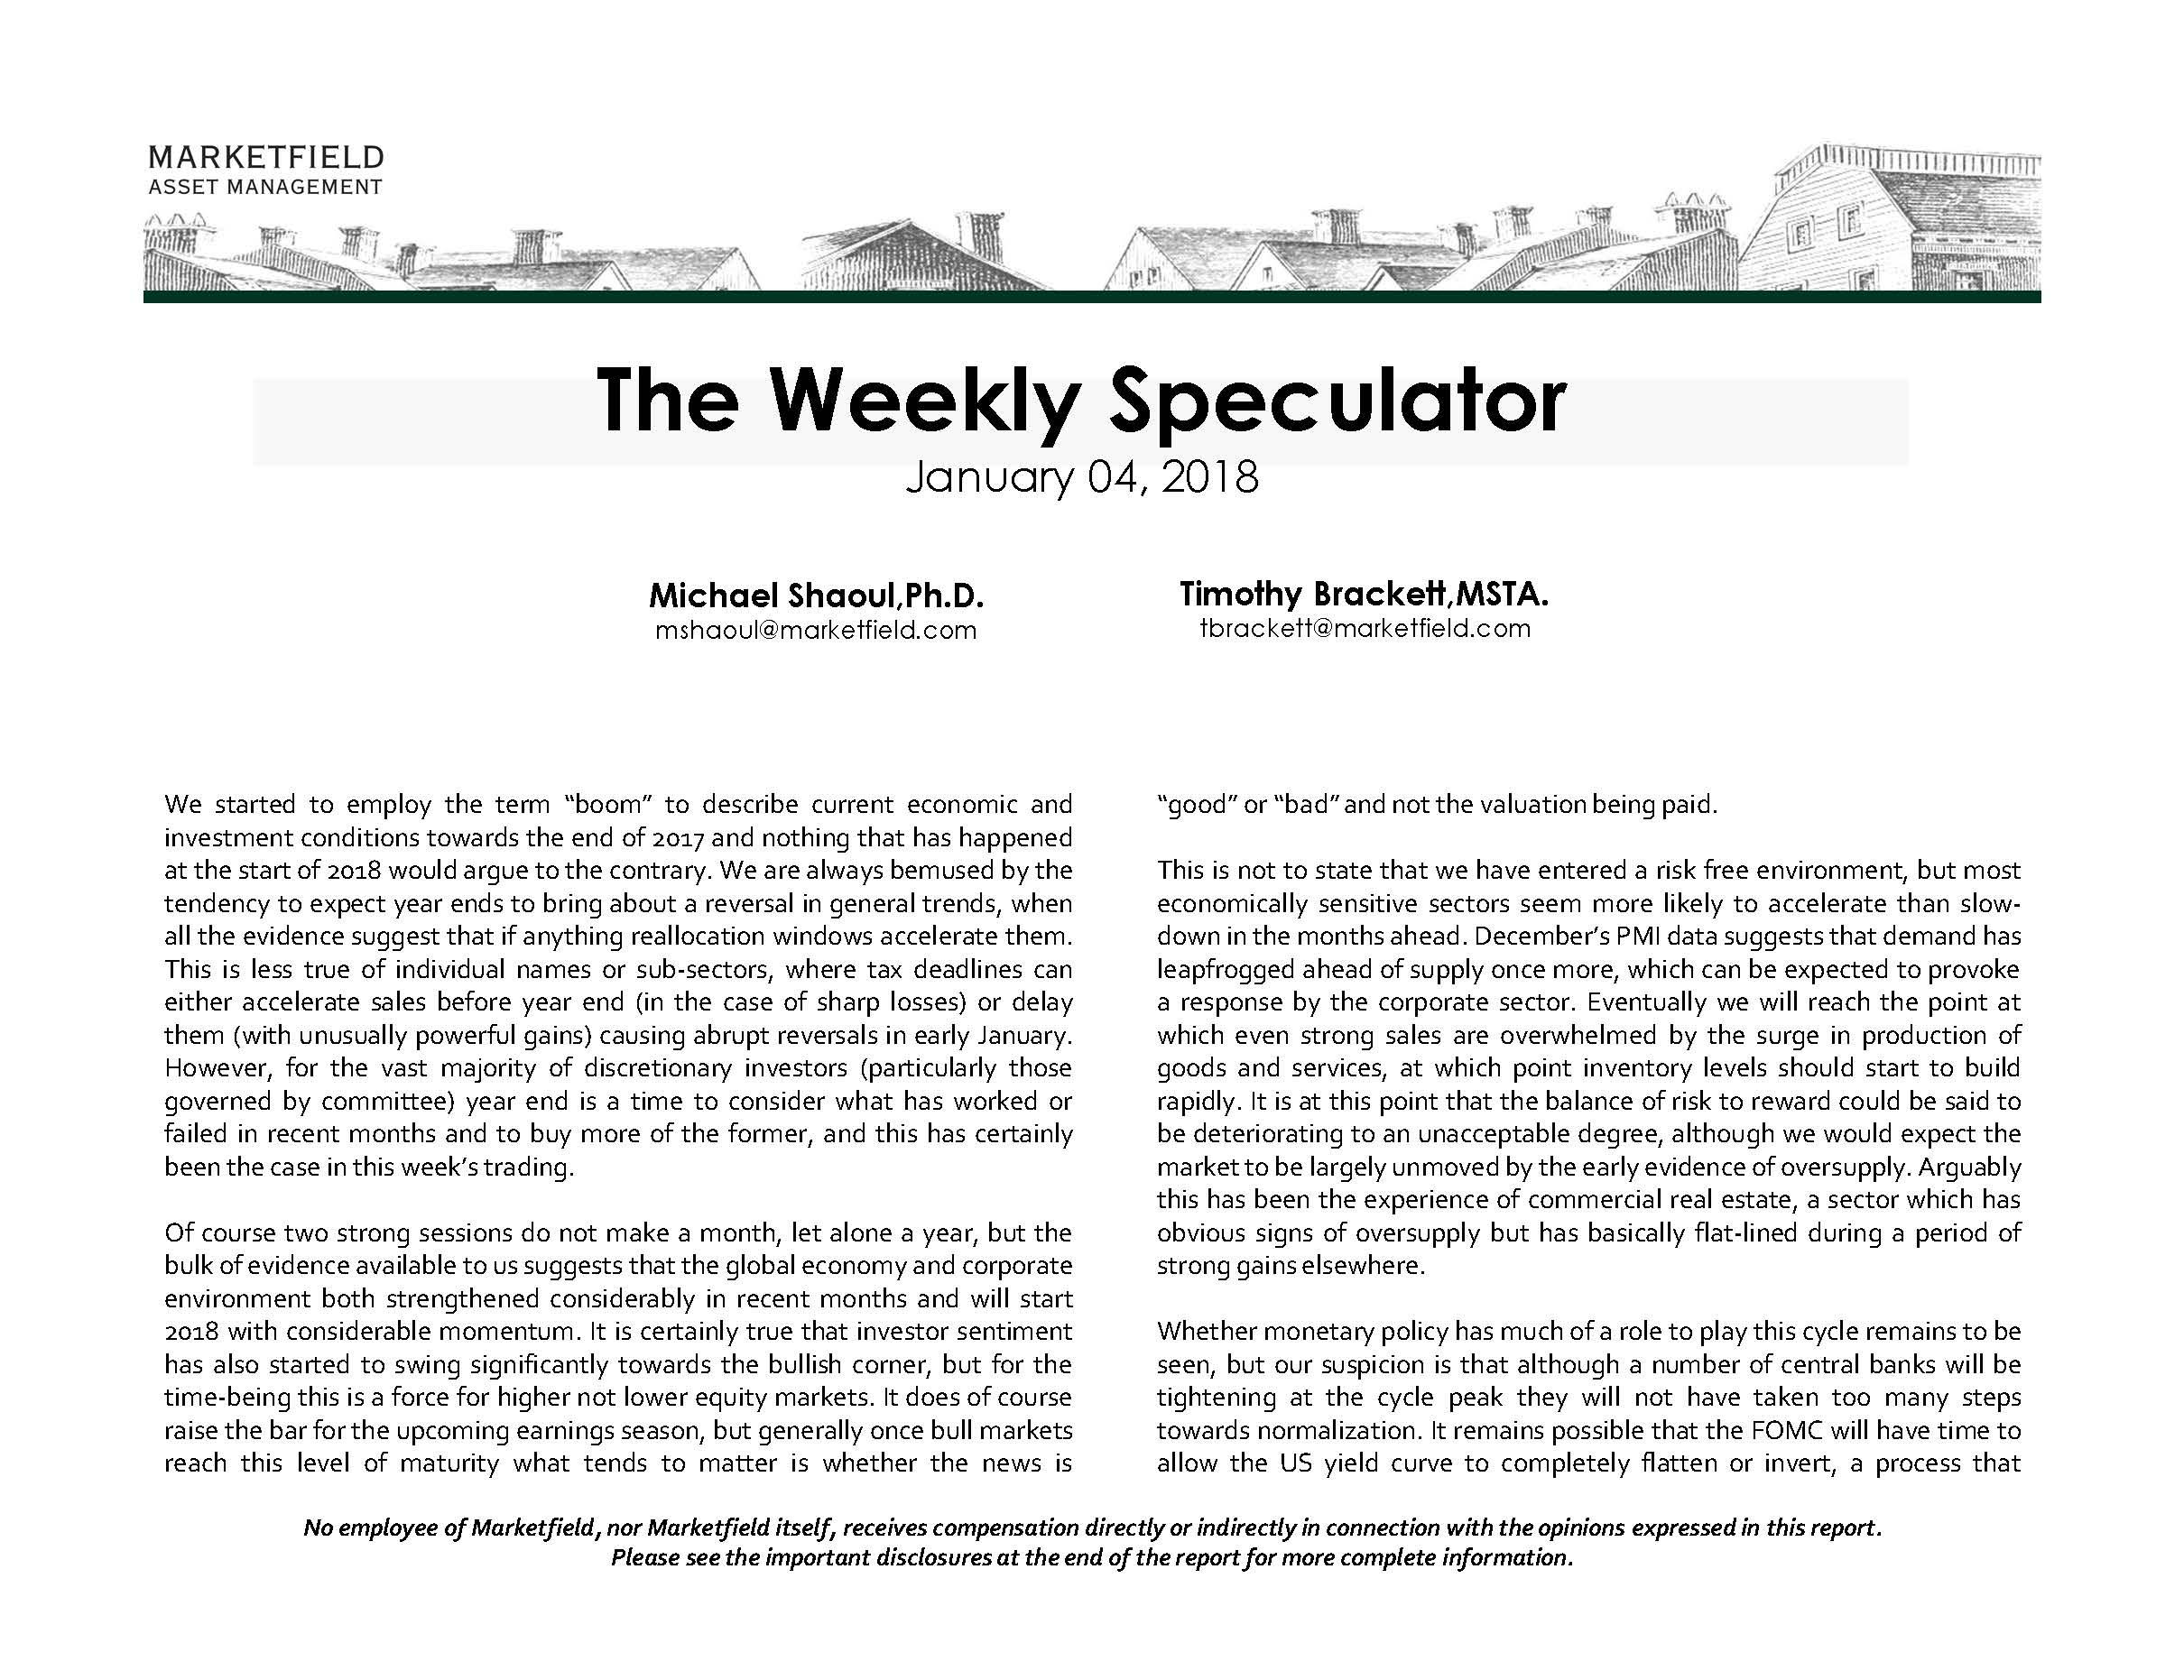 marketfield weekly speculator 01-04-18_Page_01.jpg